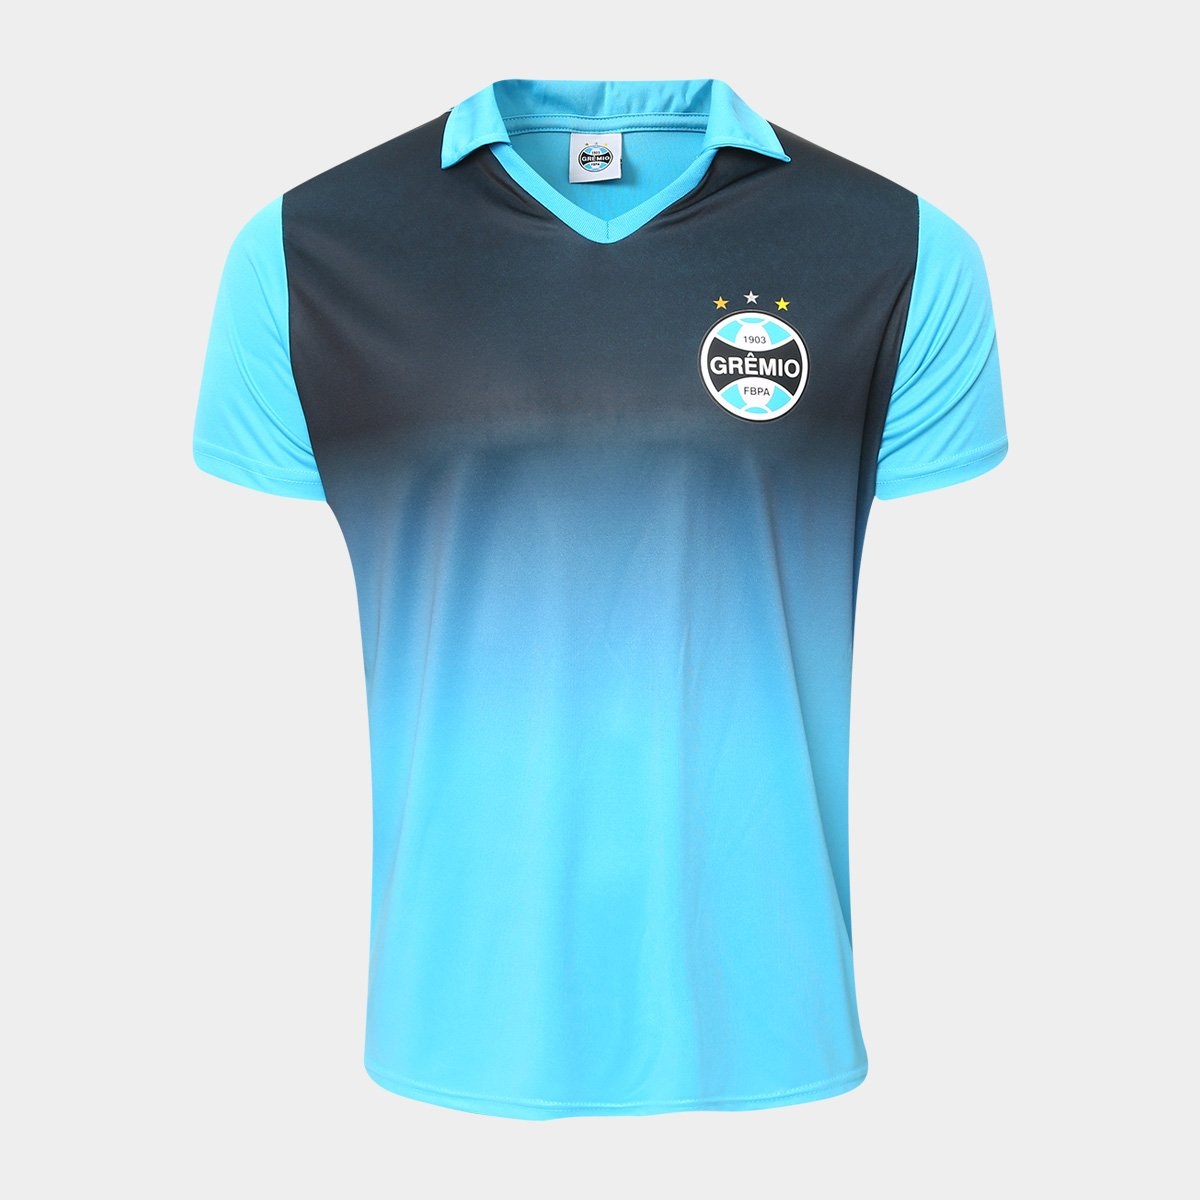 5a1560a7093d4 Camisa Polo Grêmio Tricolor Masculina